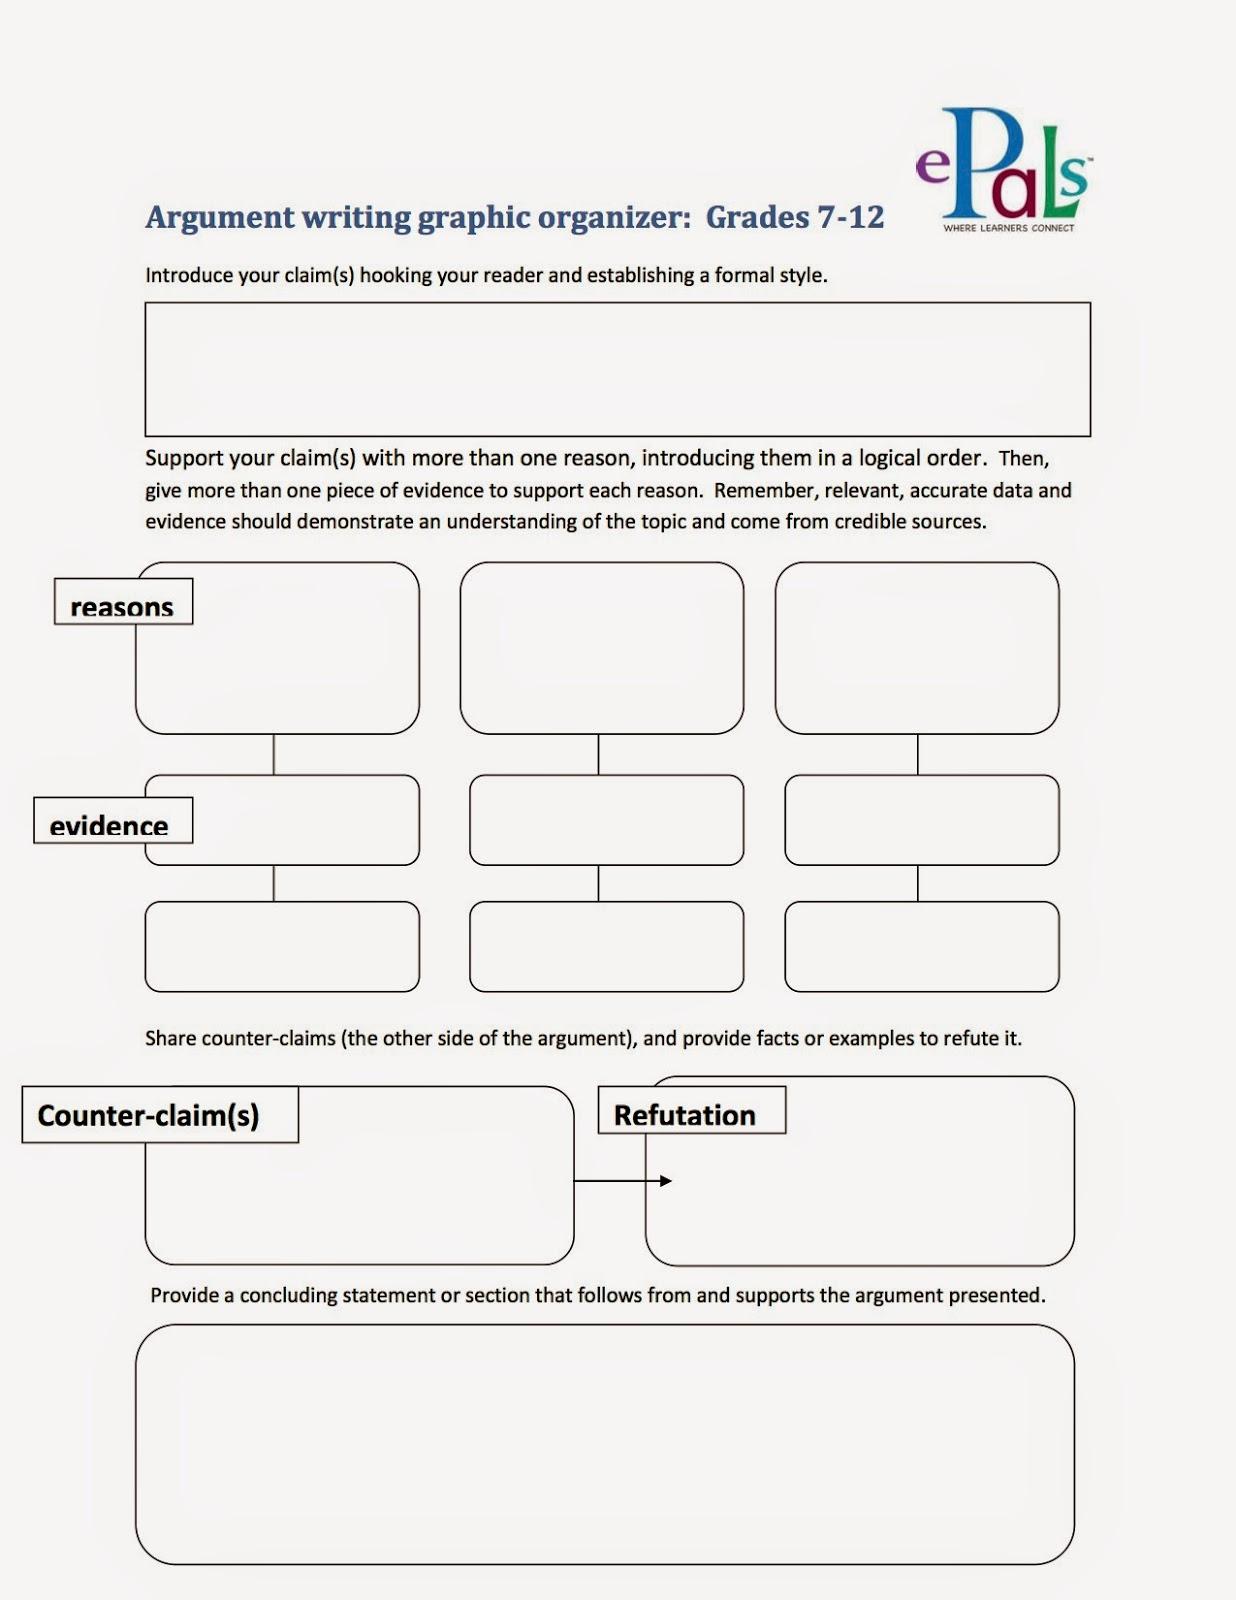 005 Argumentgraphicorganizer2bcopy Argument Essay Graphic Organizer Breathtaking Persuasive Examples Middle School Argumentative Pdf Full